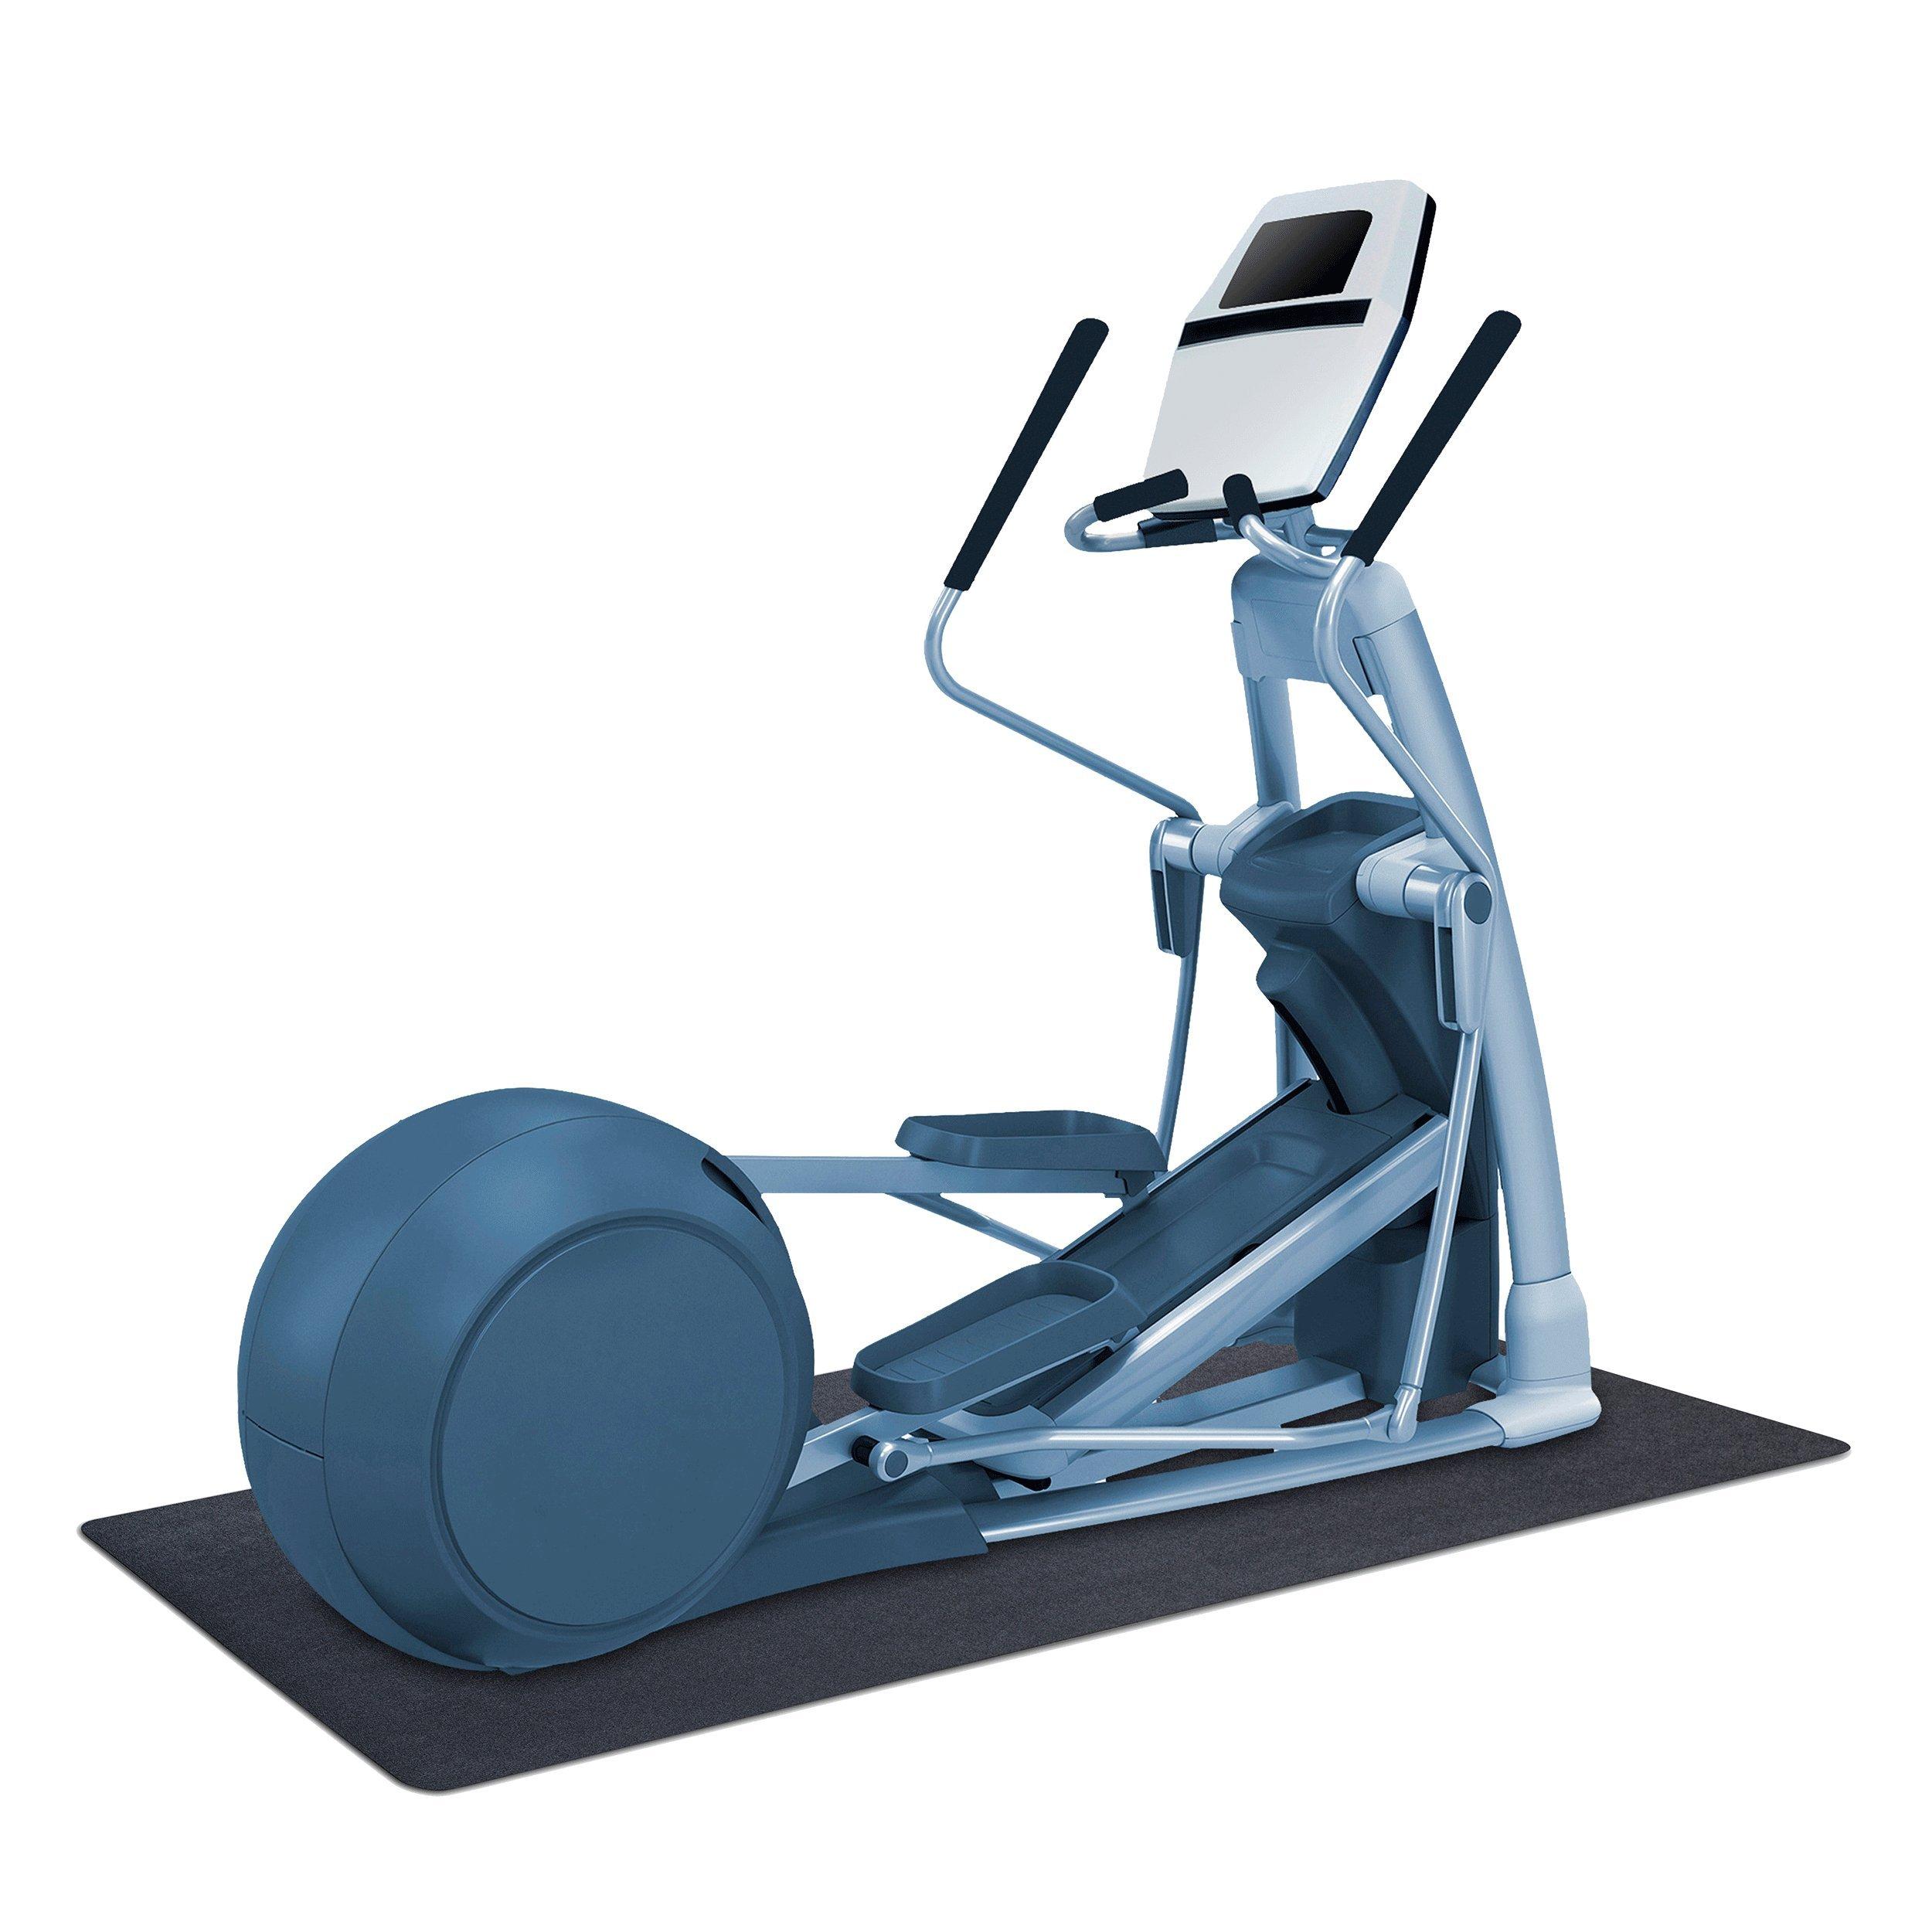 MotionTex 8M-110-30C-6.5 Fitness Equipment Mat, 30'' x 78'', Black by MotionTex